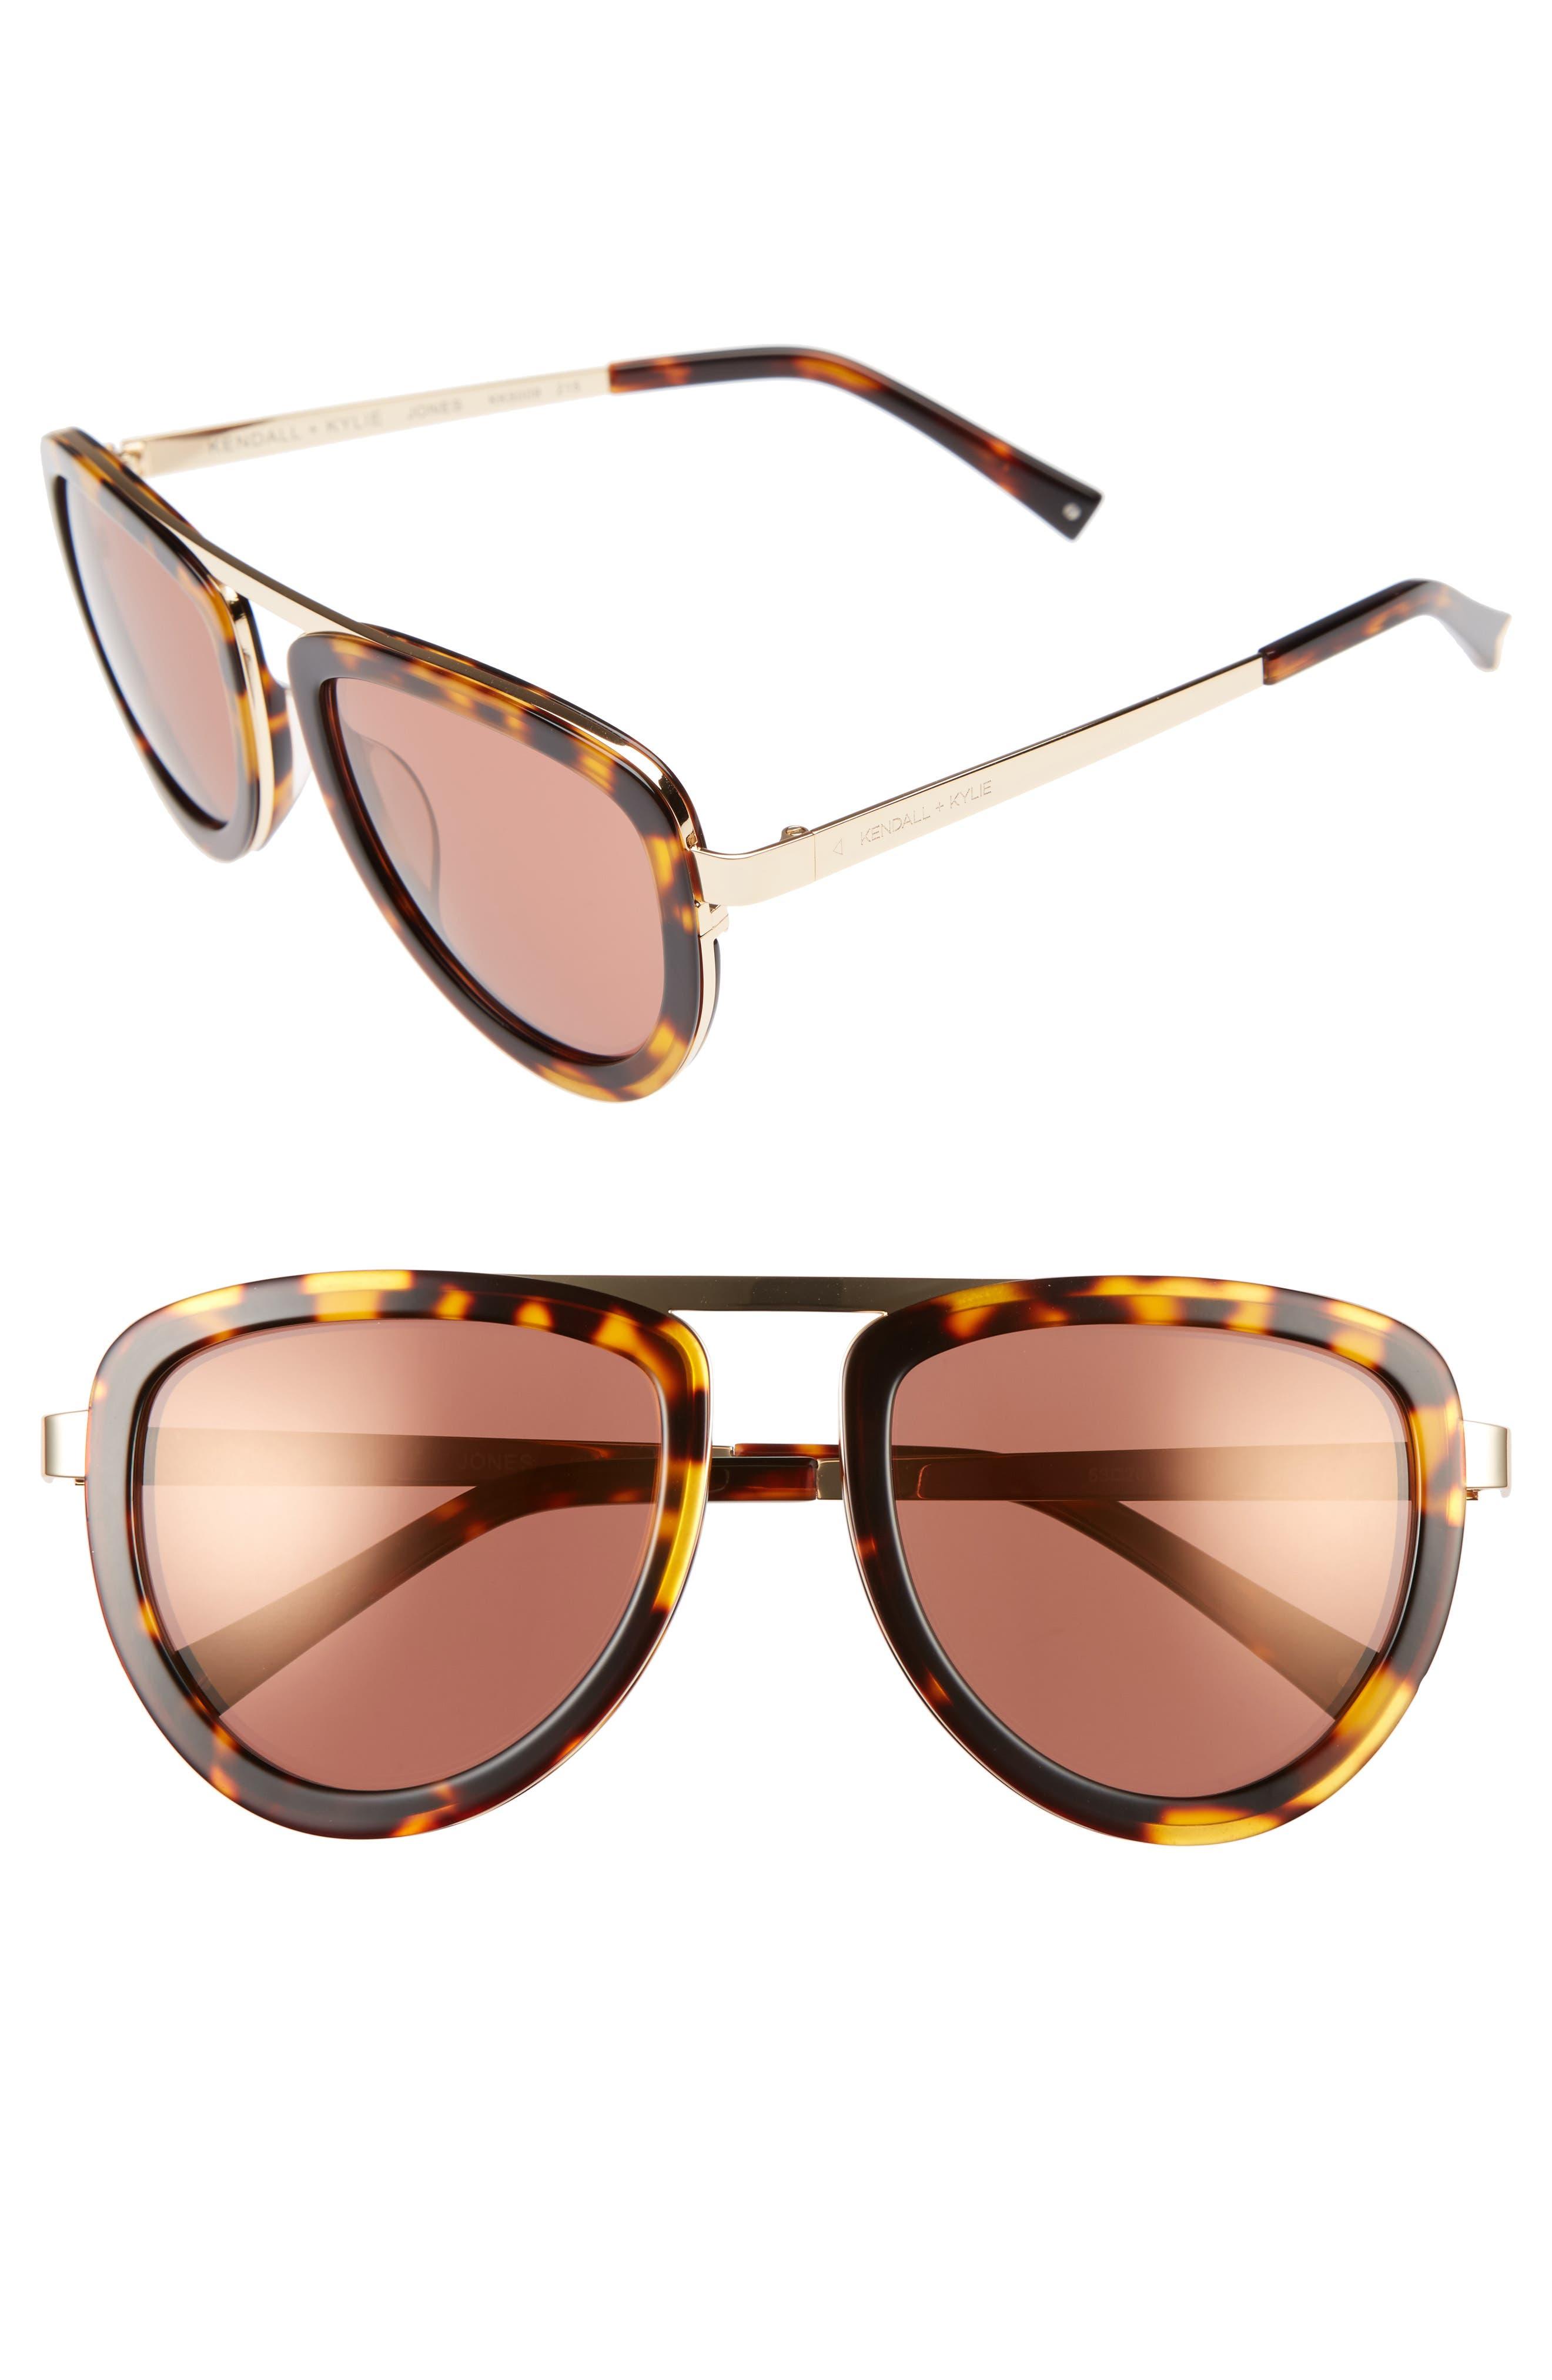 53mm Aviator Sunglasses,                         Main,                         color, Dark Demi/ Shiny Gold